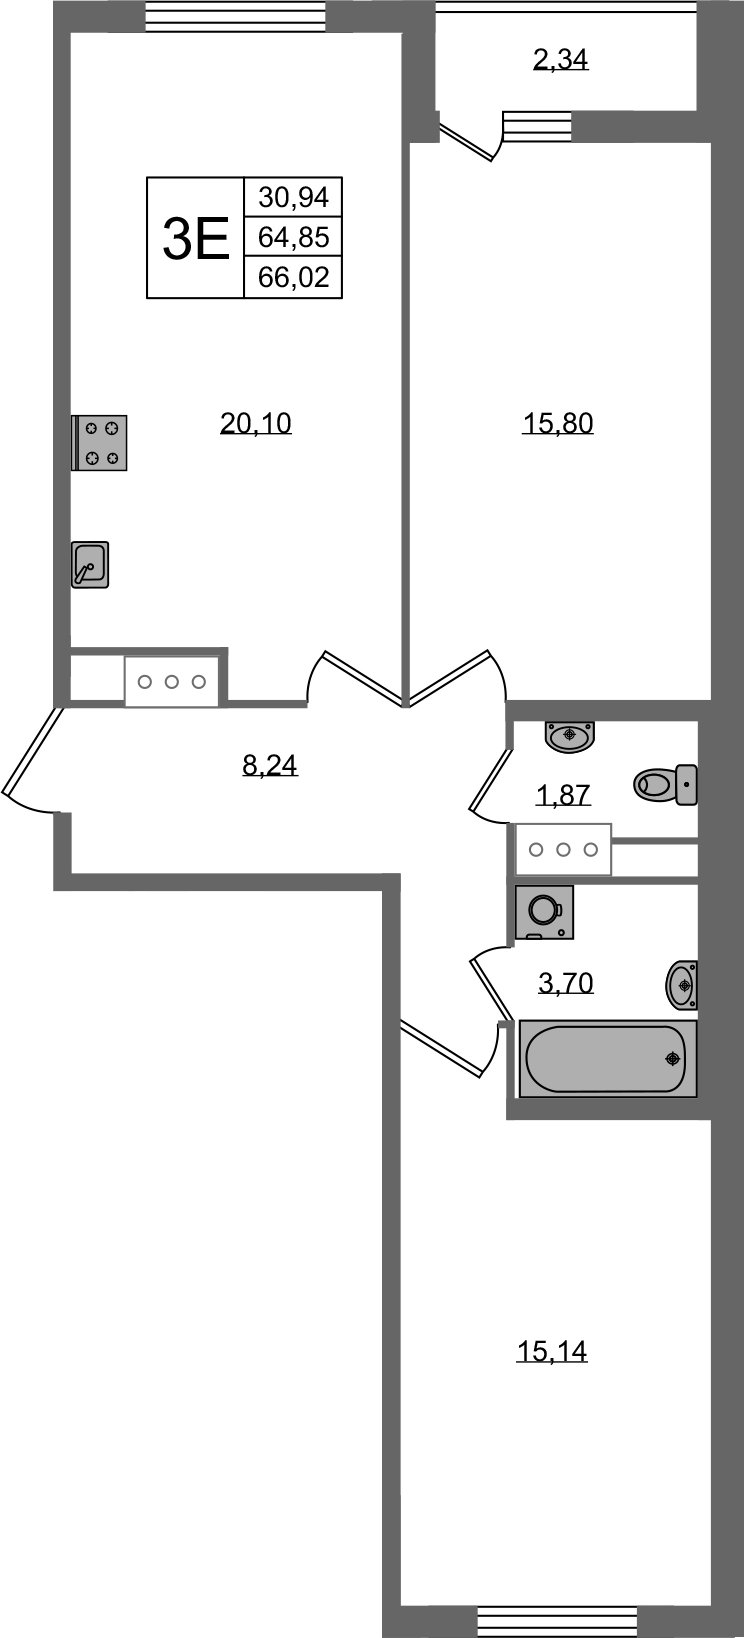 3Е-к.кв, 64.85 м², от 2 этажа